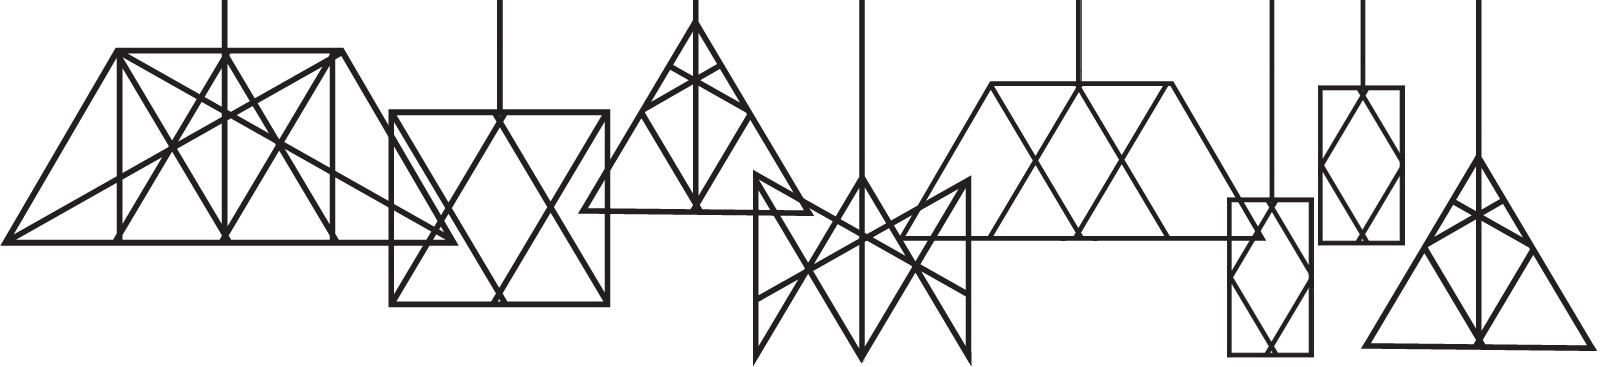 Grafika lampy 2BM dEsign